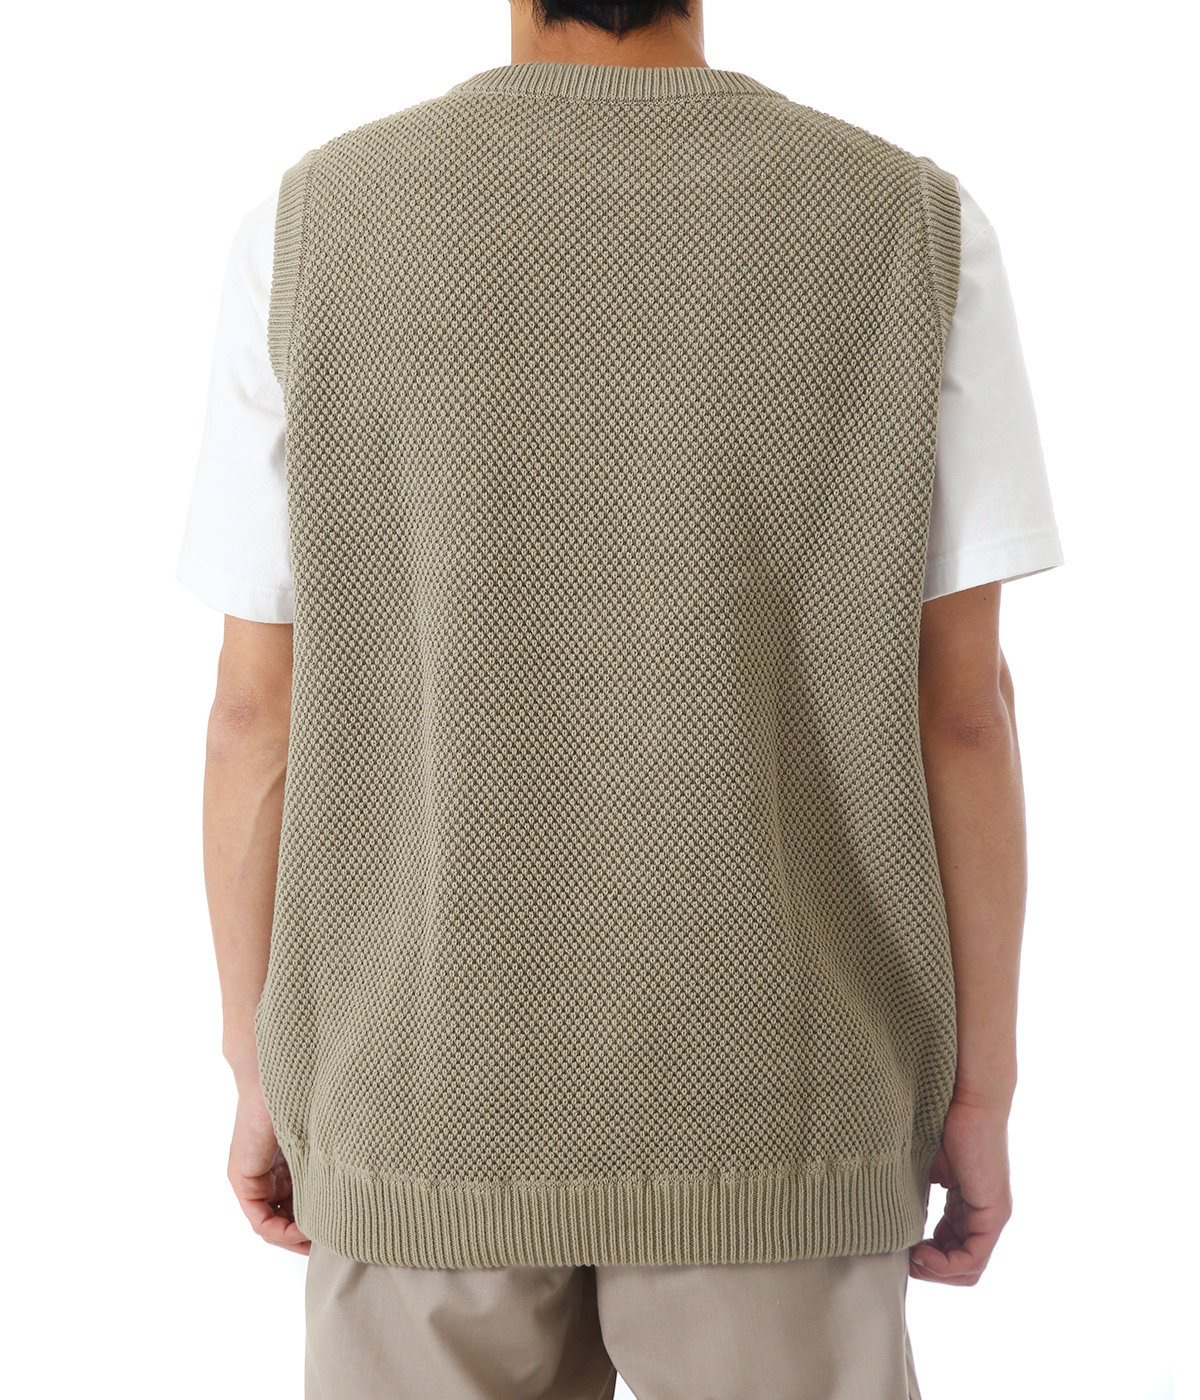 【別注】moss stich vest